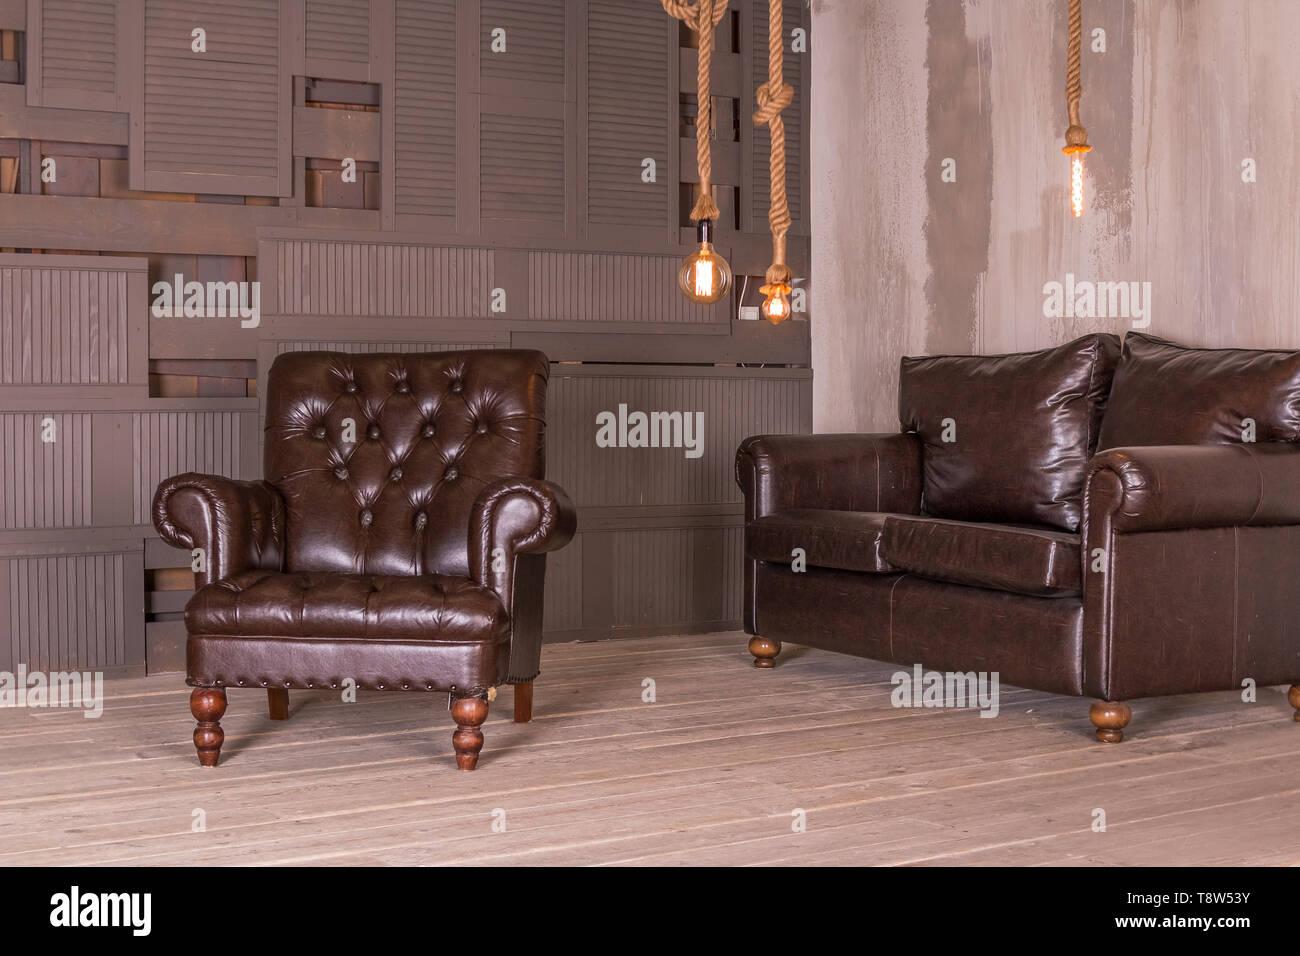 Tremendous Brown Leather Armchair And Vintage Leather Sofa Interior Creativecarmelina Interior Chair Design Creativecarmelinacom